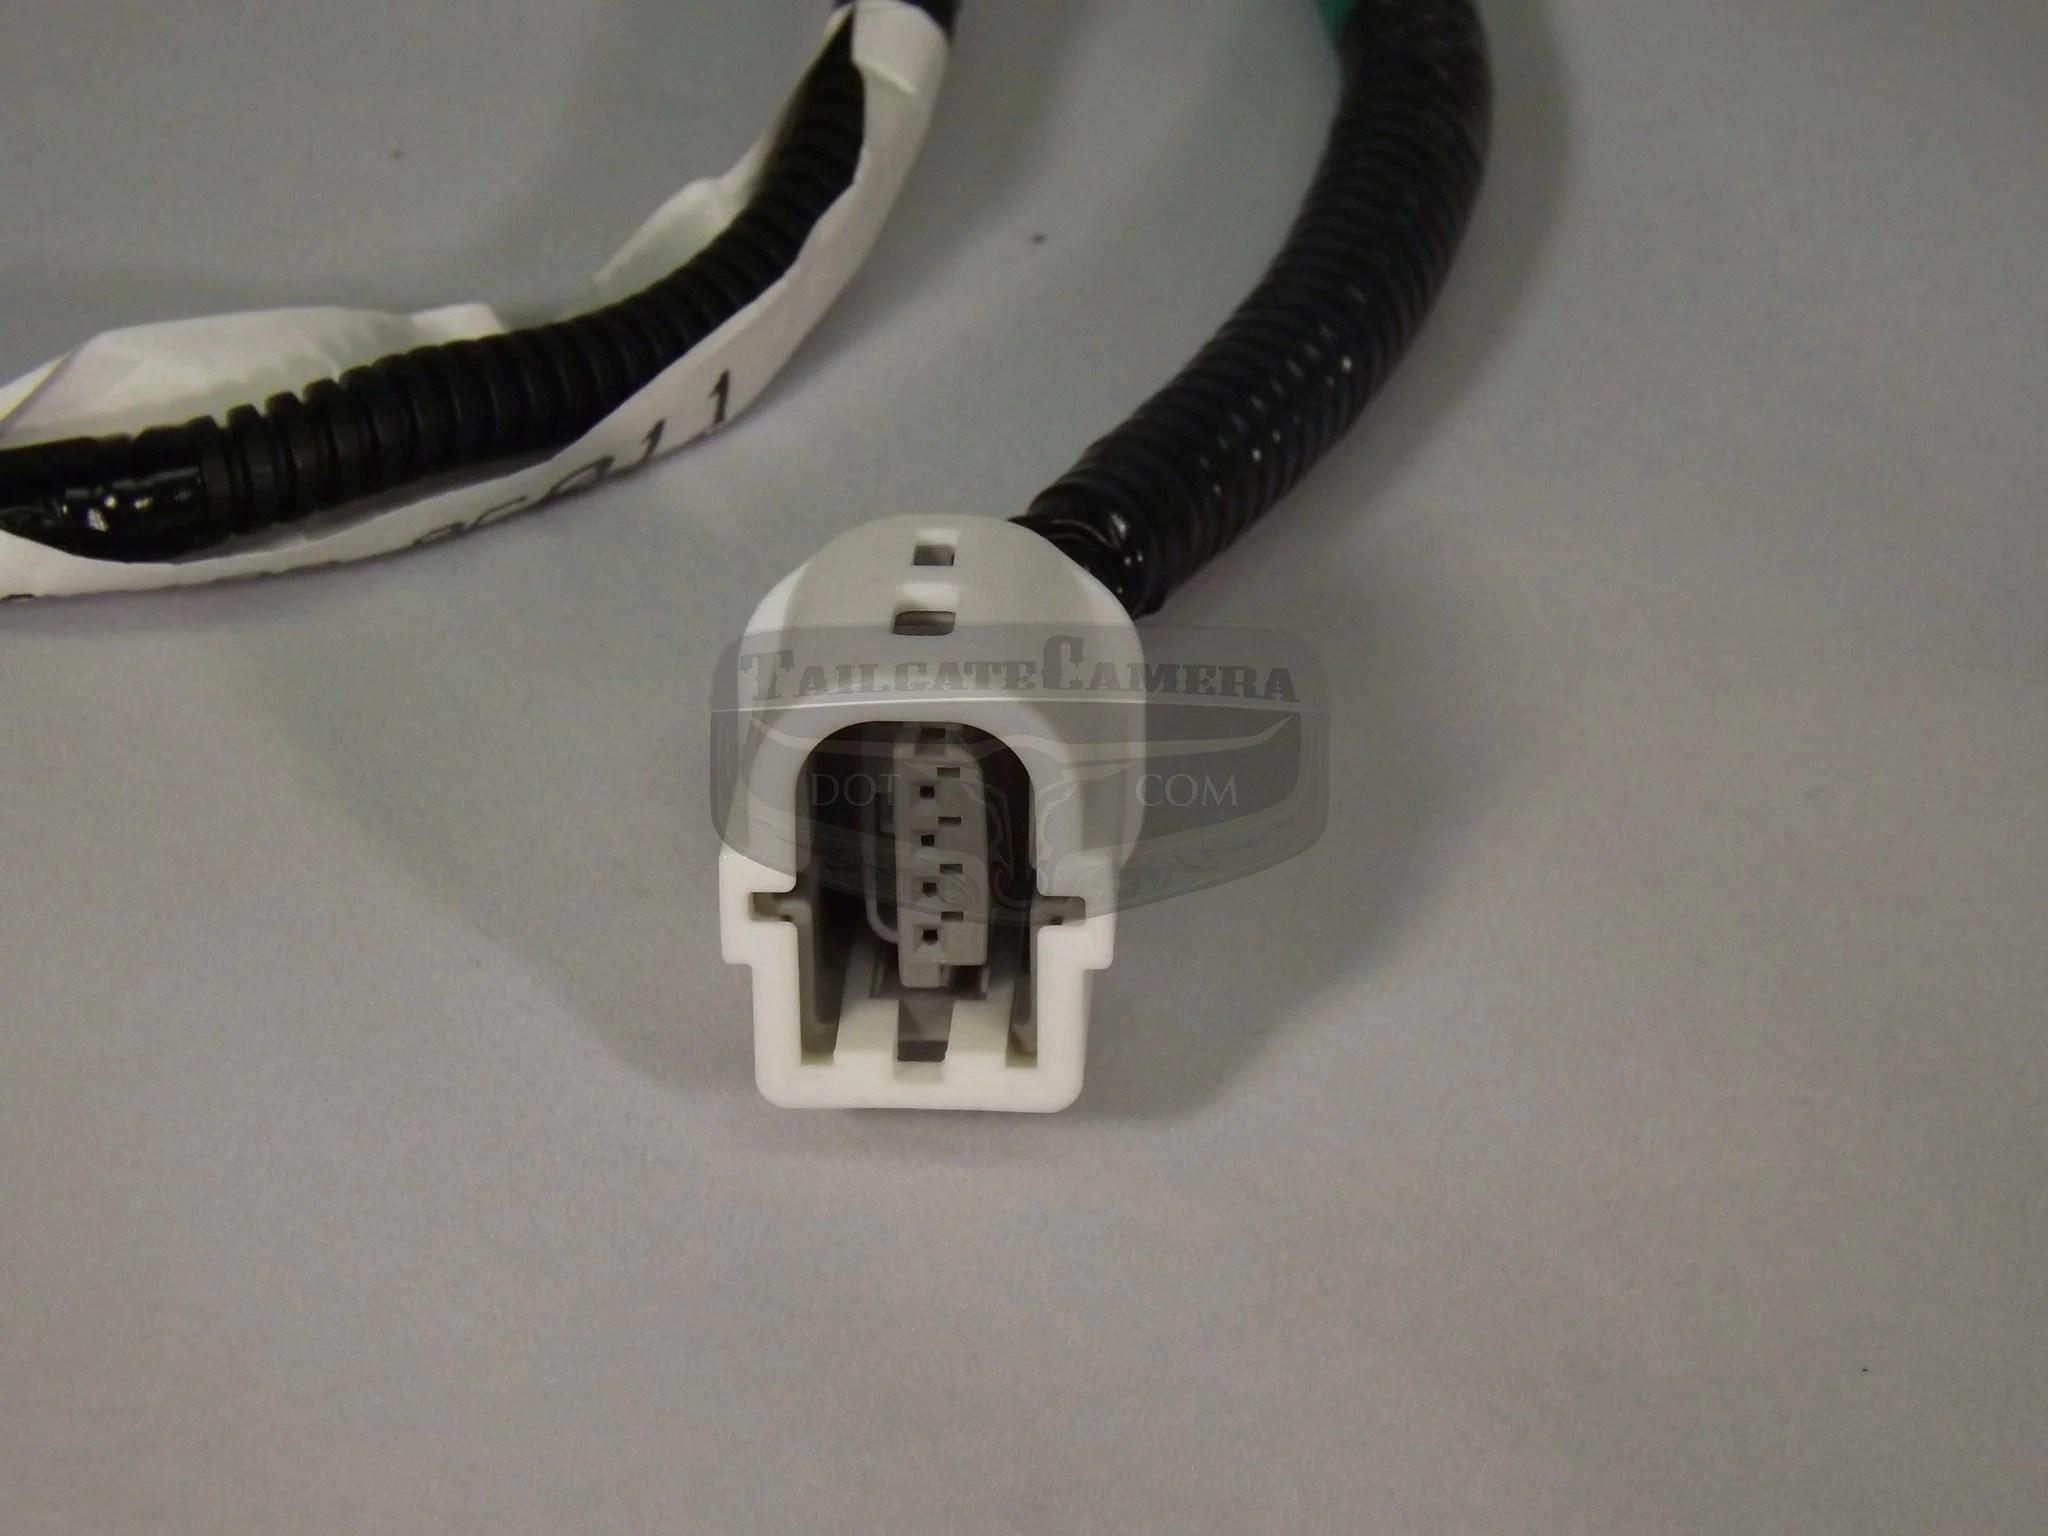 2006 toyota tundra radio wiring diagram club car v glide troubleshooting harness data 2010 2018 hd camera kit with oem tailgate